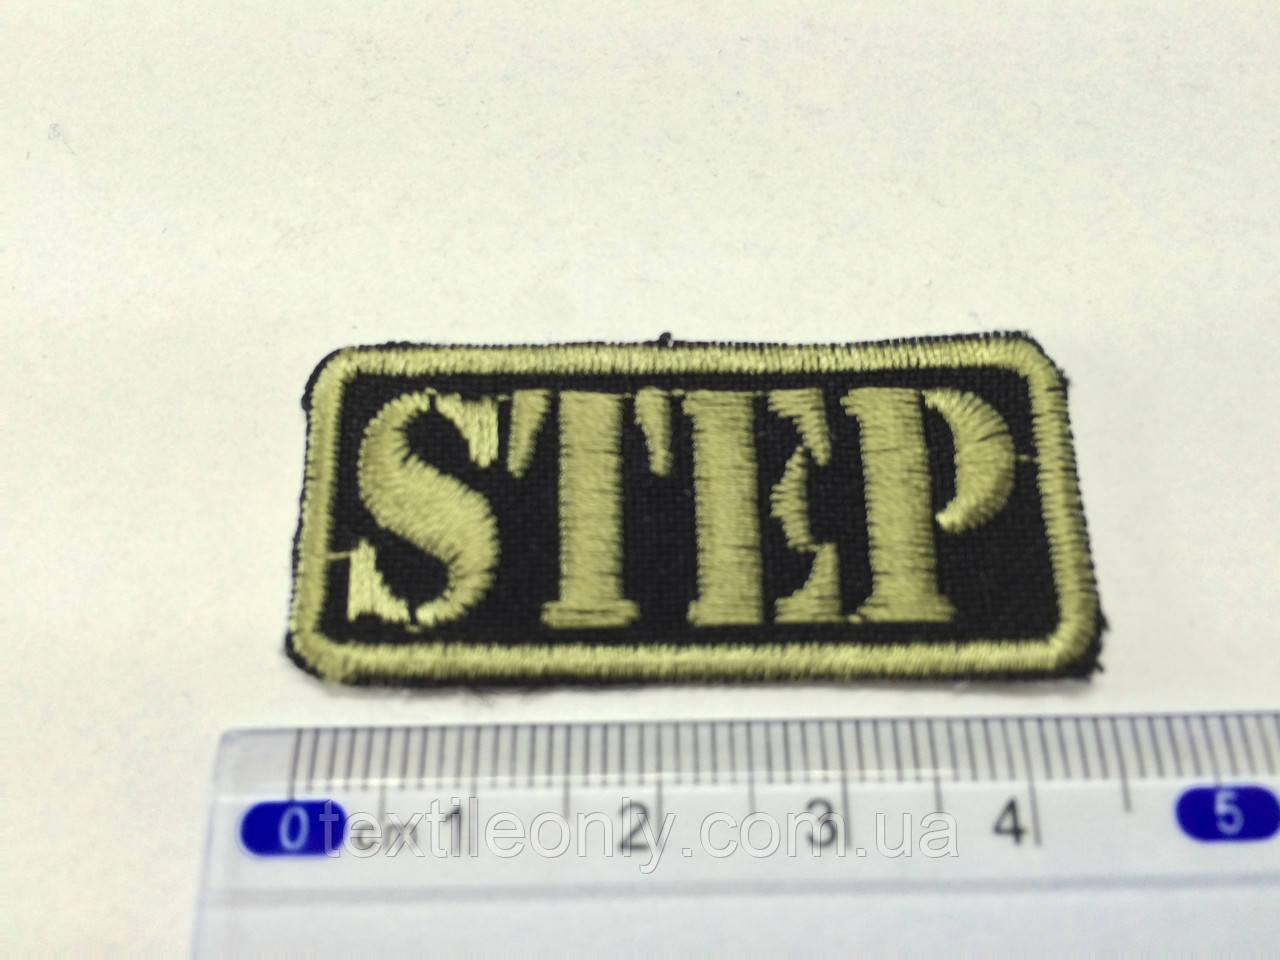 Нашивка STEP планка хаки